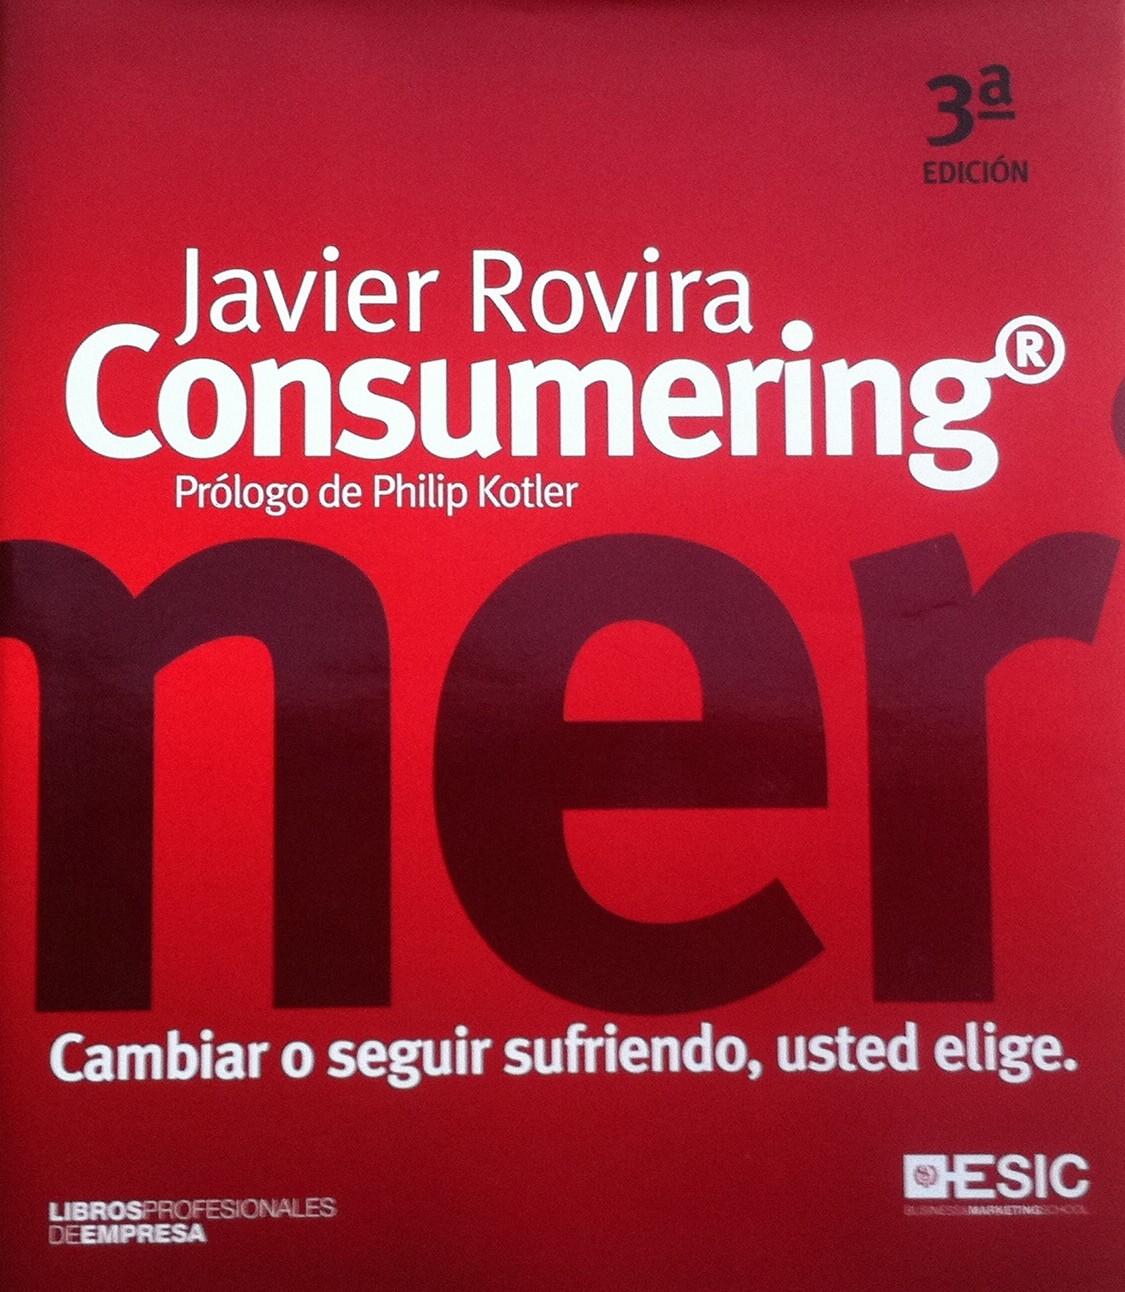 "Libro recomendado: Javier Rovira ""Consumering"""